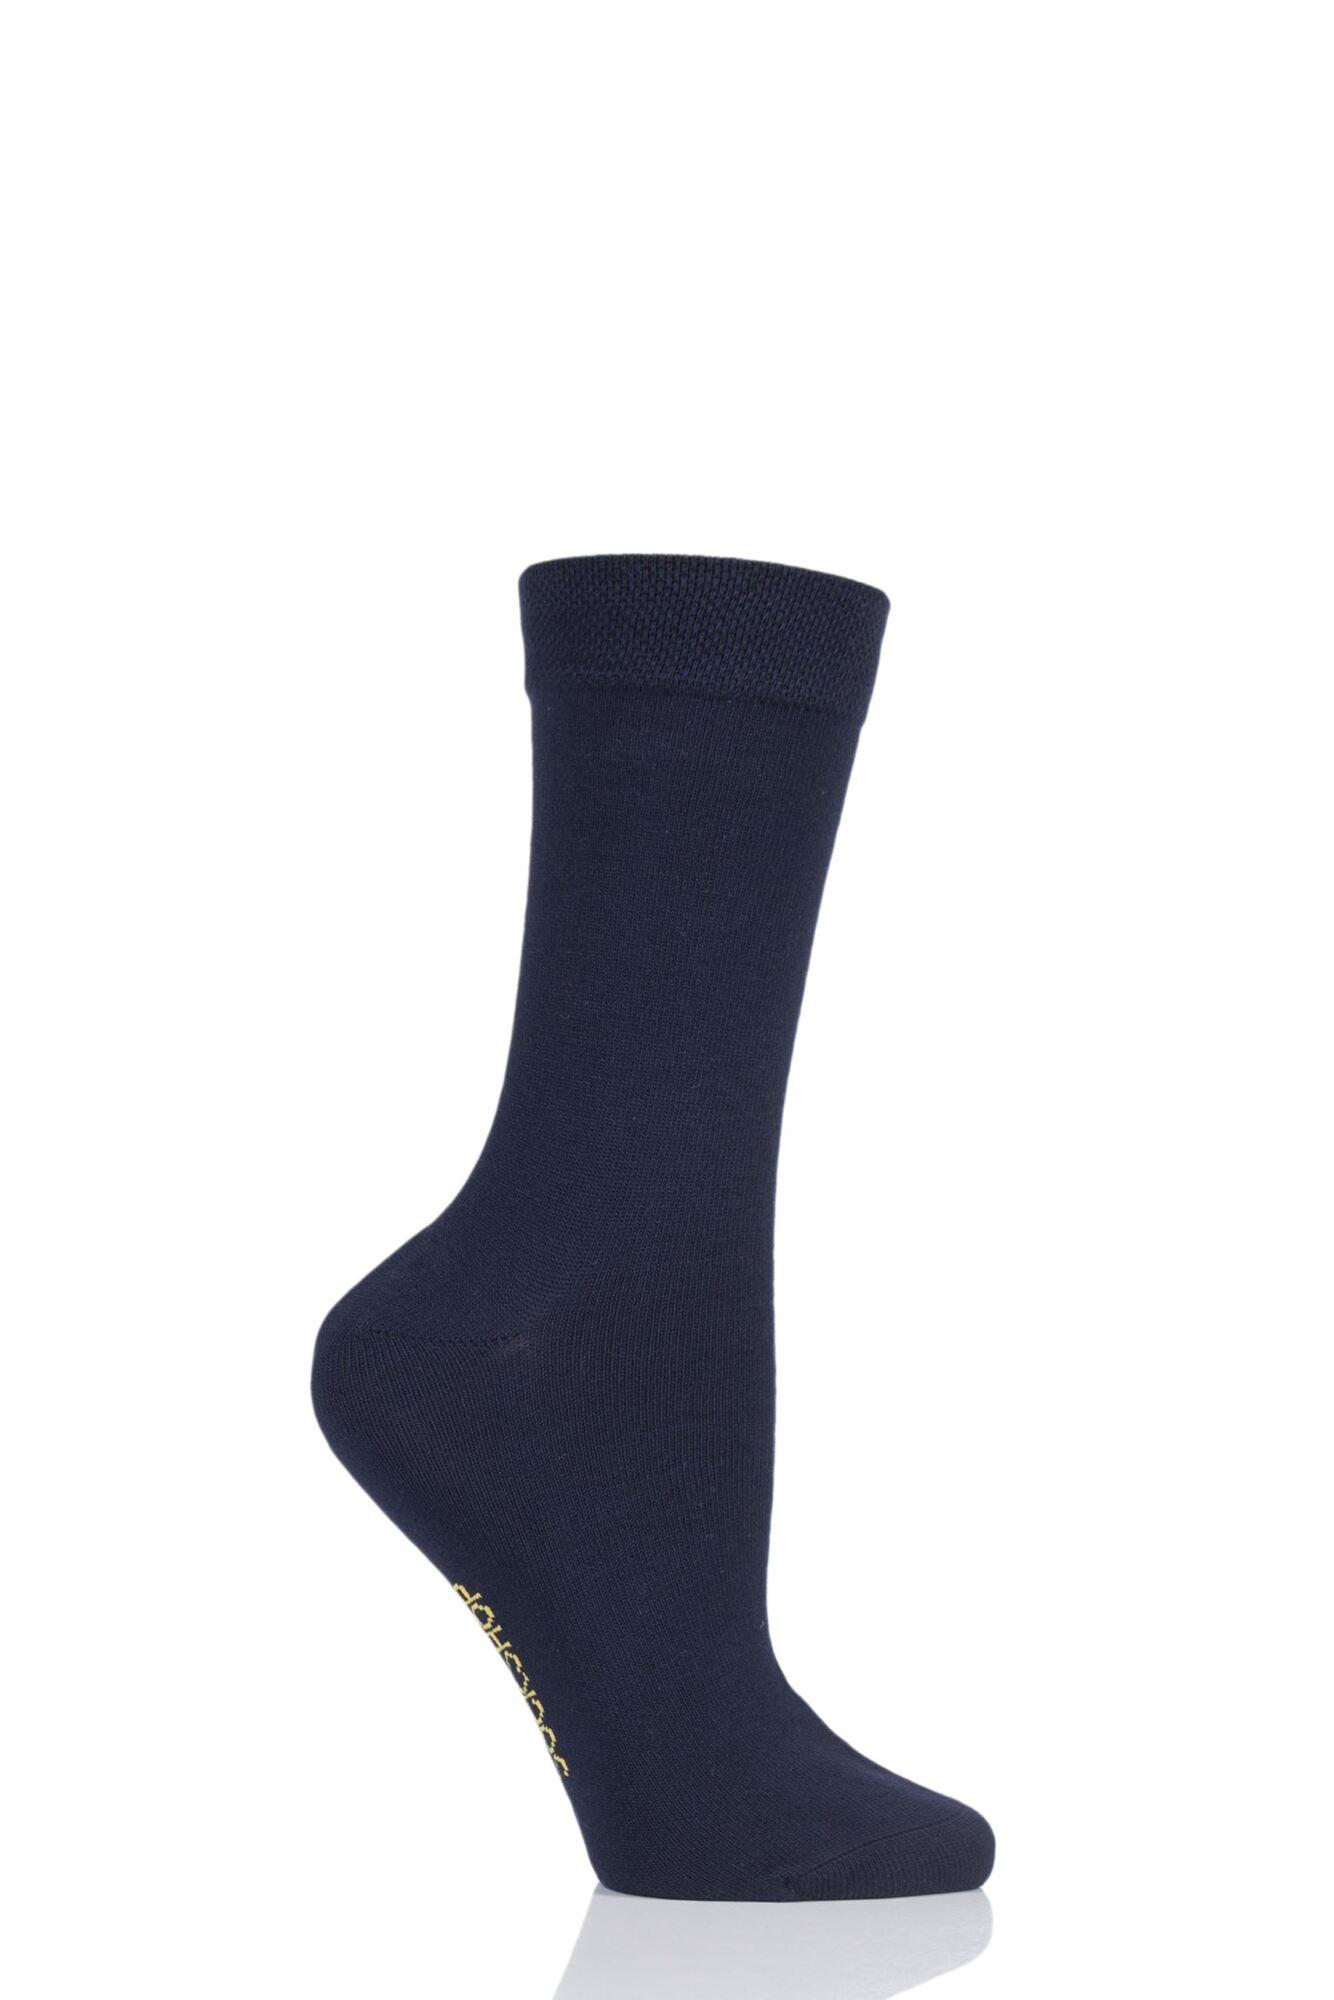 1 Pair Colour Burst Bamboo Socks with Smooth Toe Seams Ladies - SOCKSHOP